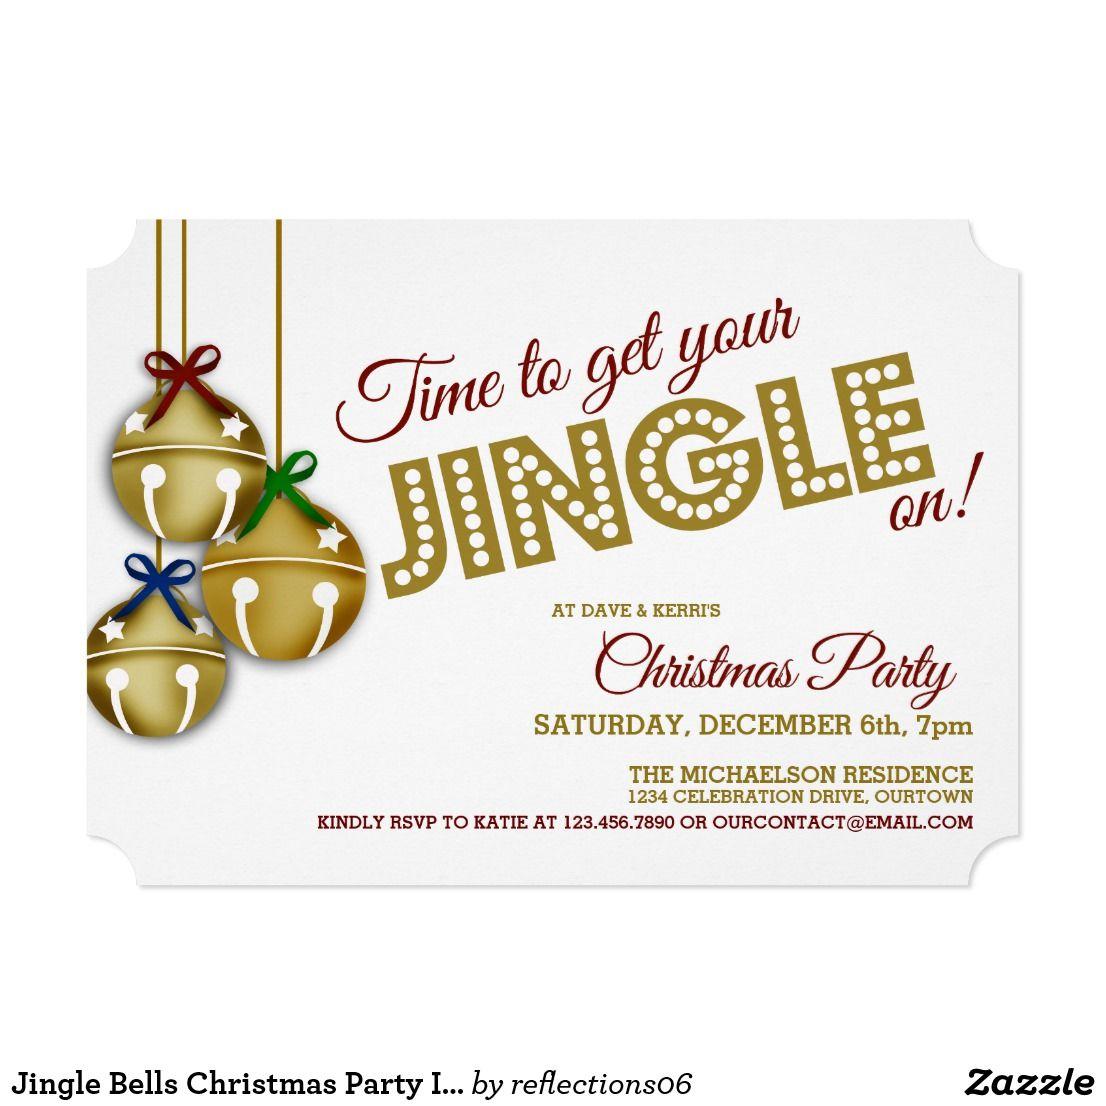 Jingle Bells Christmas Party Invitation Zazzle Com Christmas Party Invitations Party Invitations Holiday Invitations